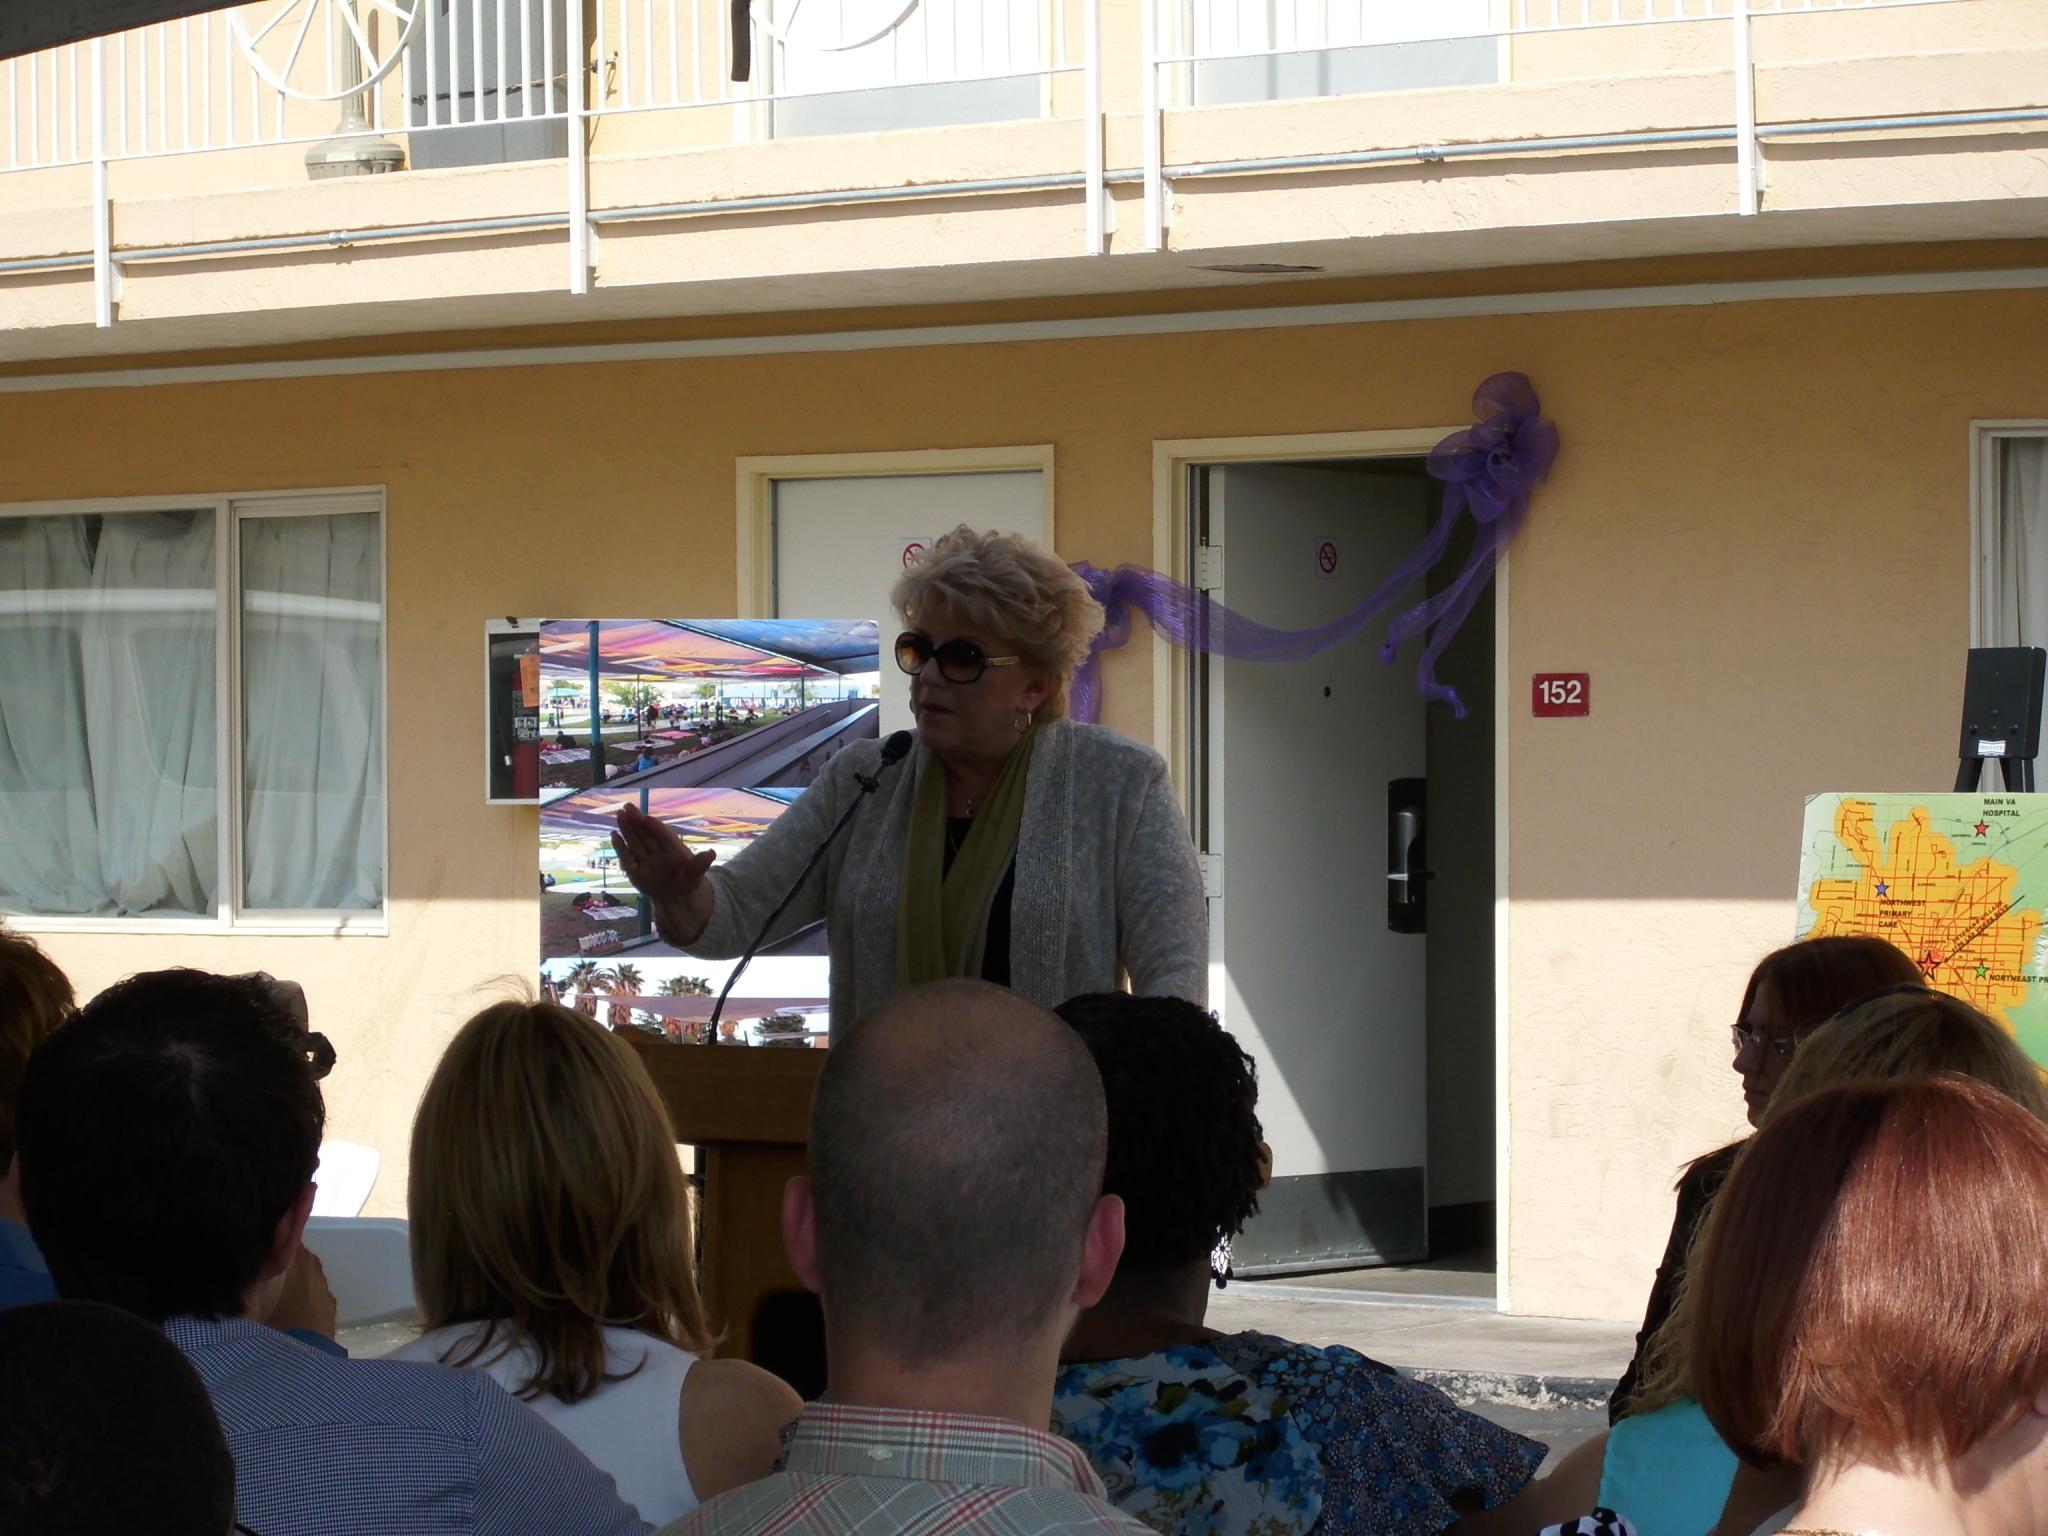 Las Vegas' Mayor Carolyn Goodman